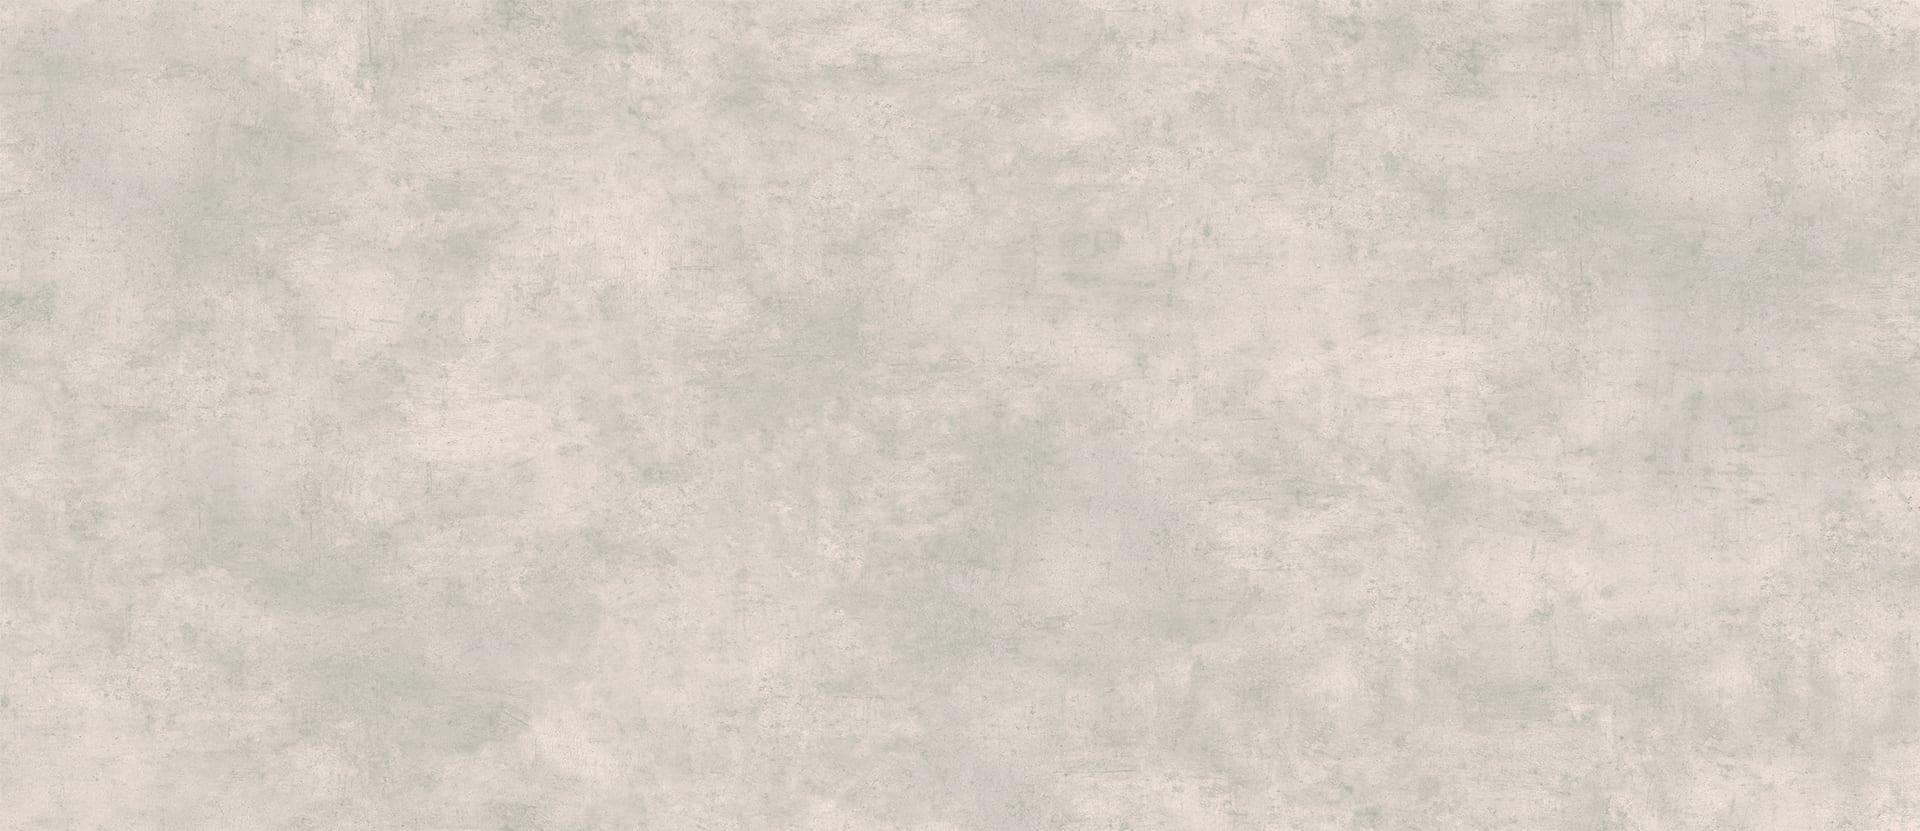 Winter Stone Full Length Laminate Worktop by Topform